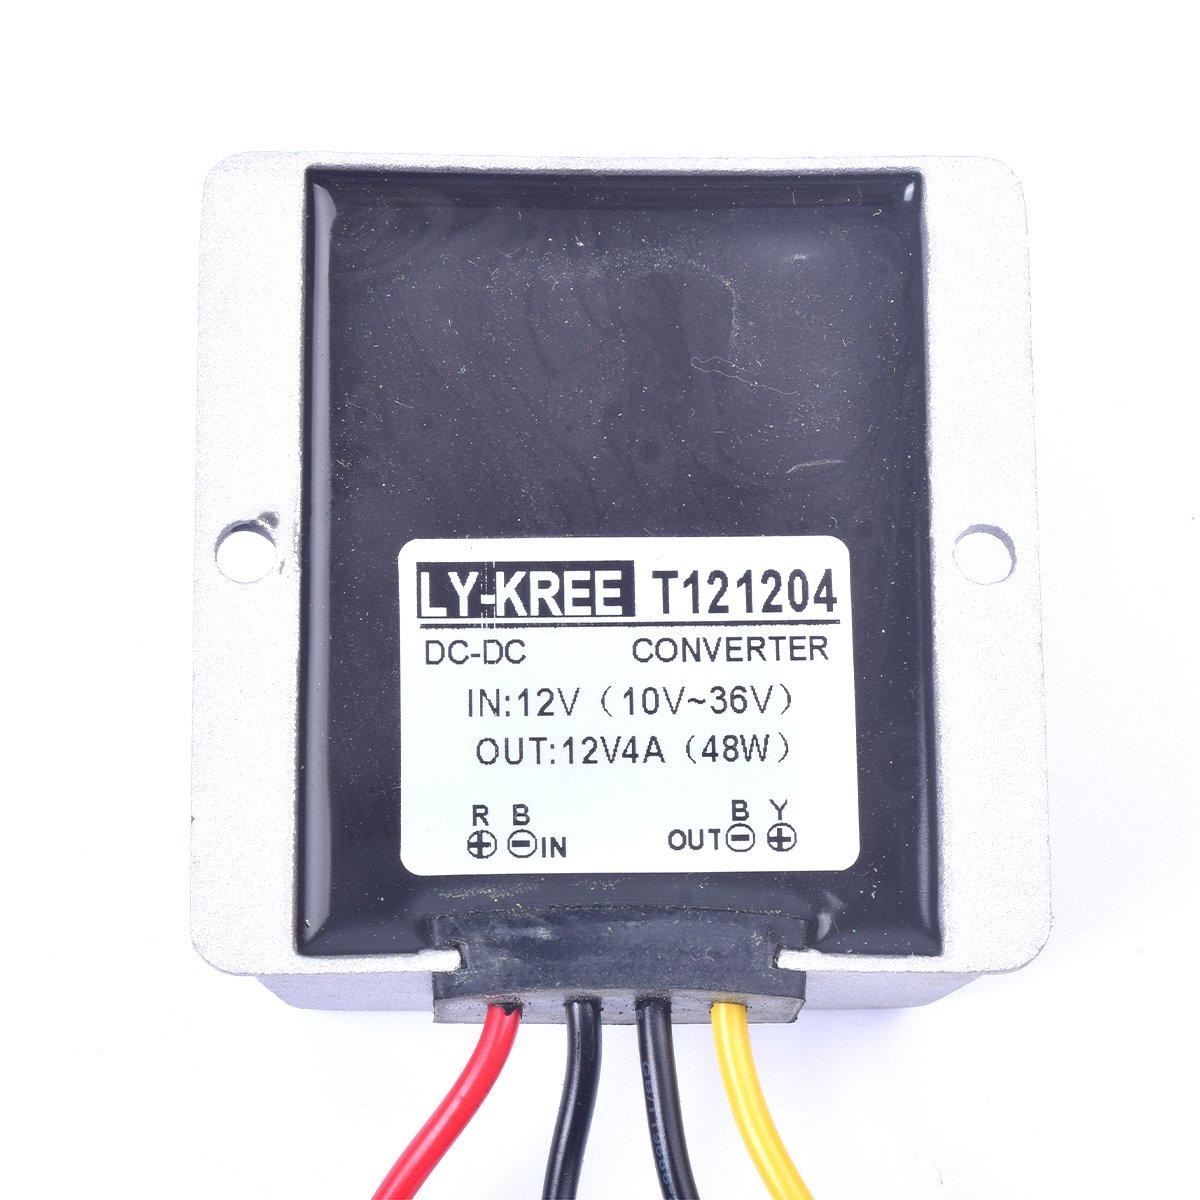 Car Dc 12v 4a Voltage Stabilizer Surge Protector Power Golf Cart Charger 36 Volt Wiring Diagram Supply Regulator For Auto Truck Vehicle Boat Solar System Etcdc10 36v Input Dc12v